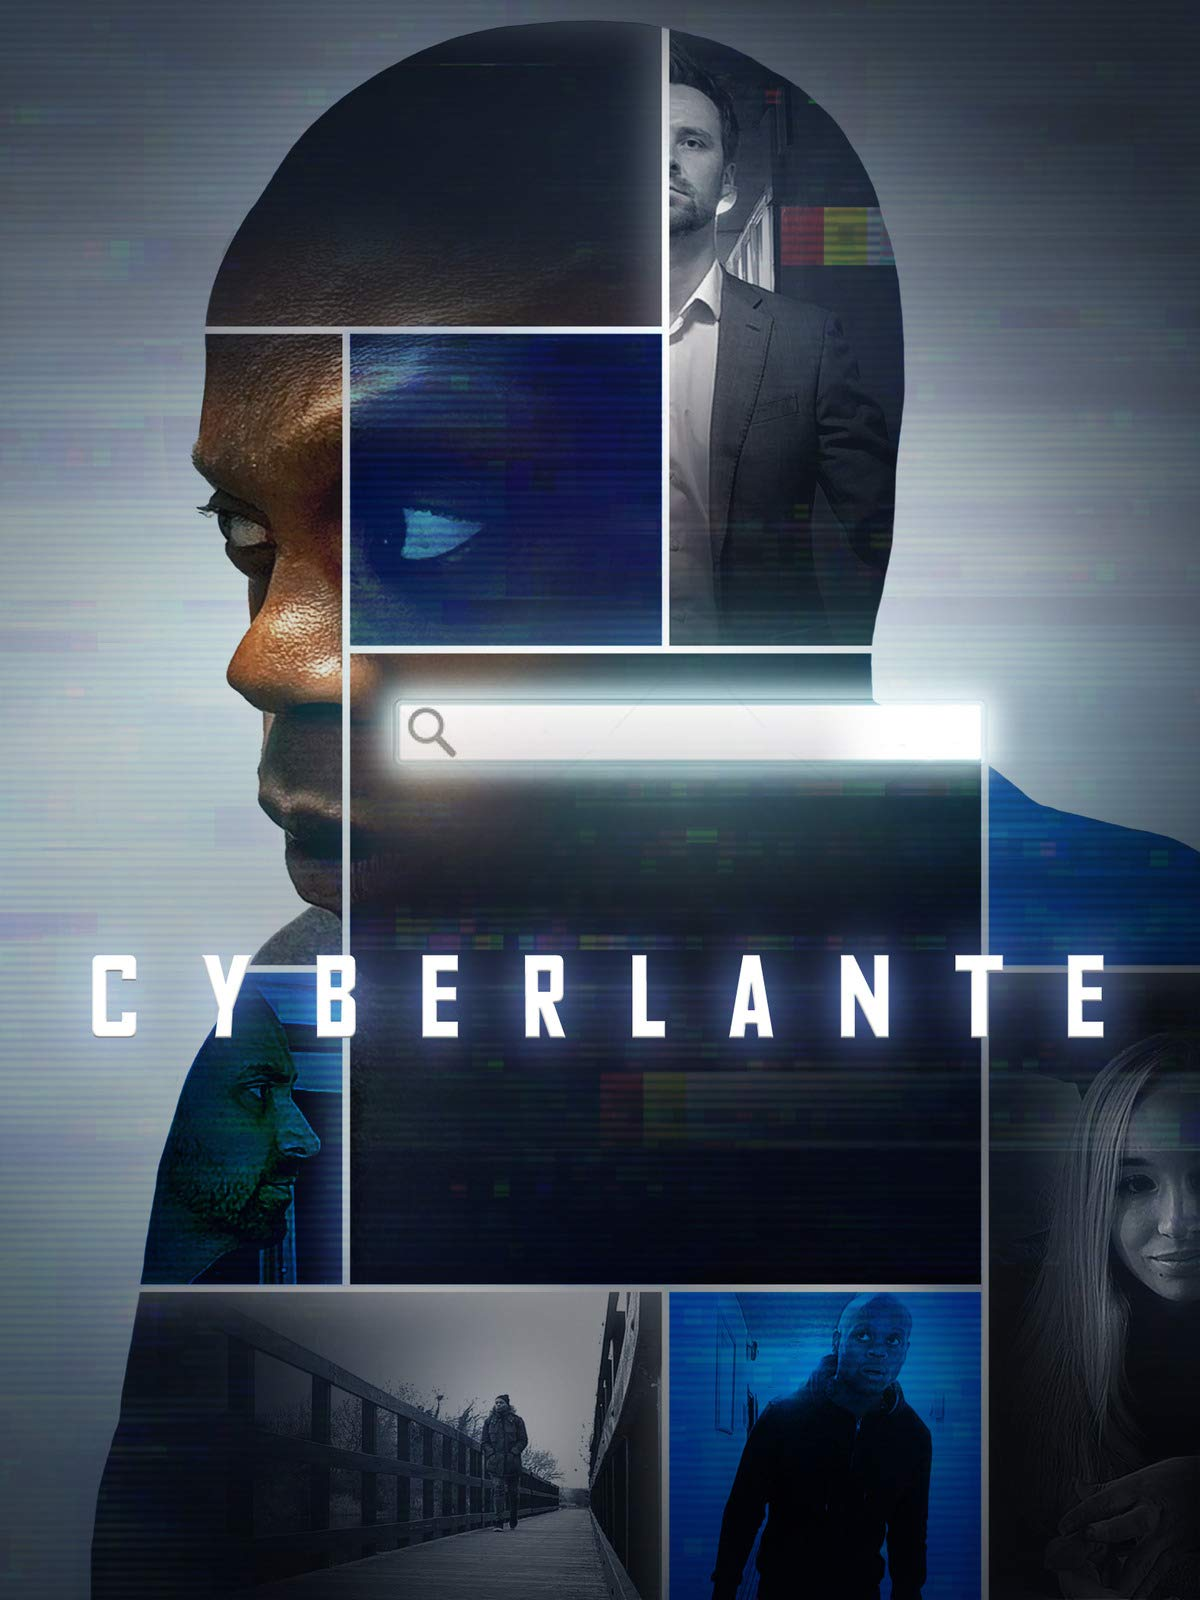 Cyberlante